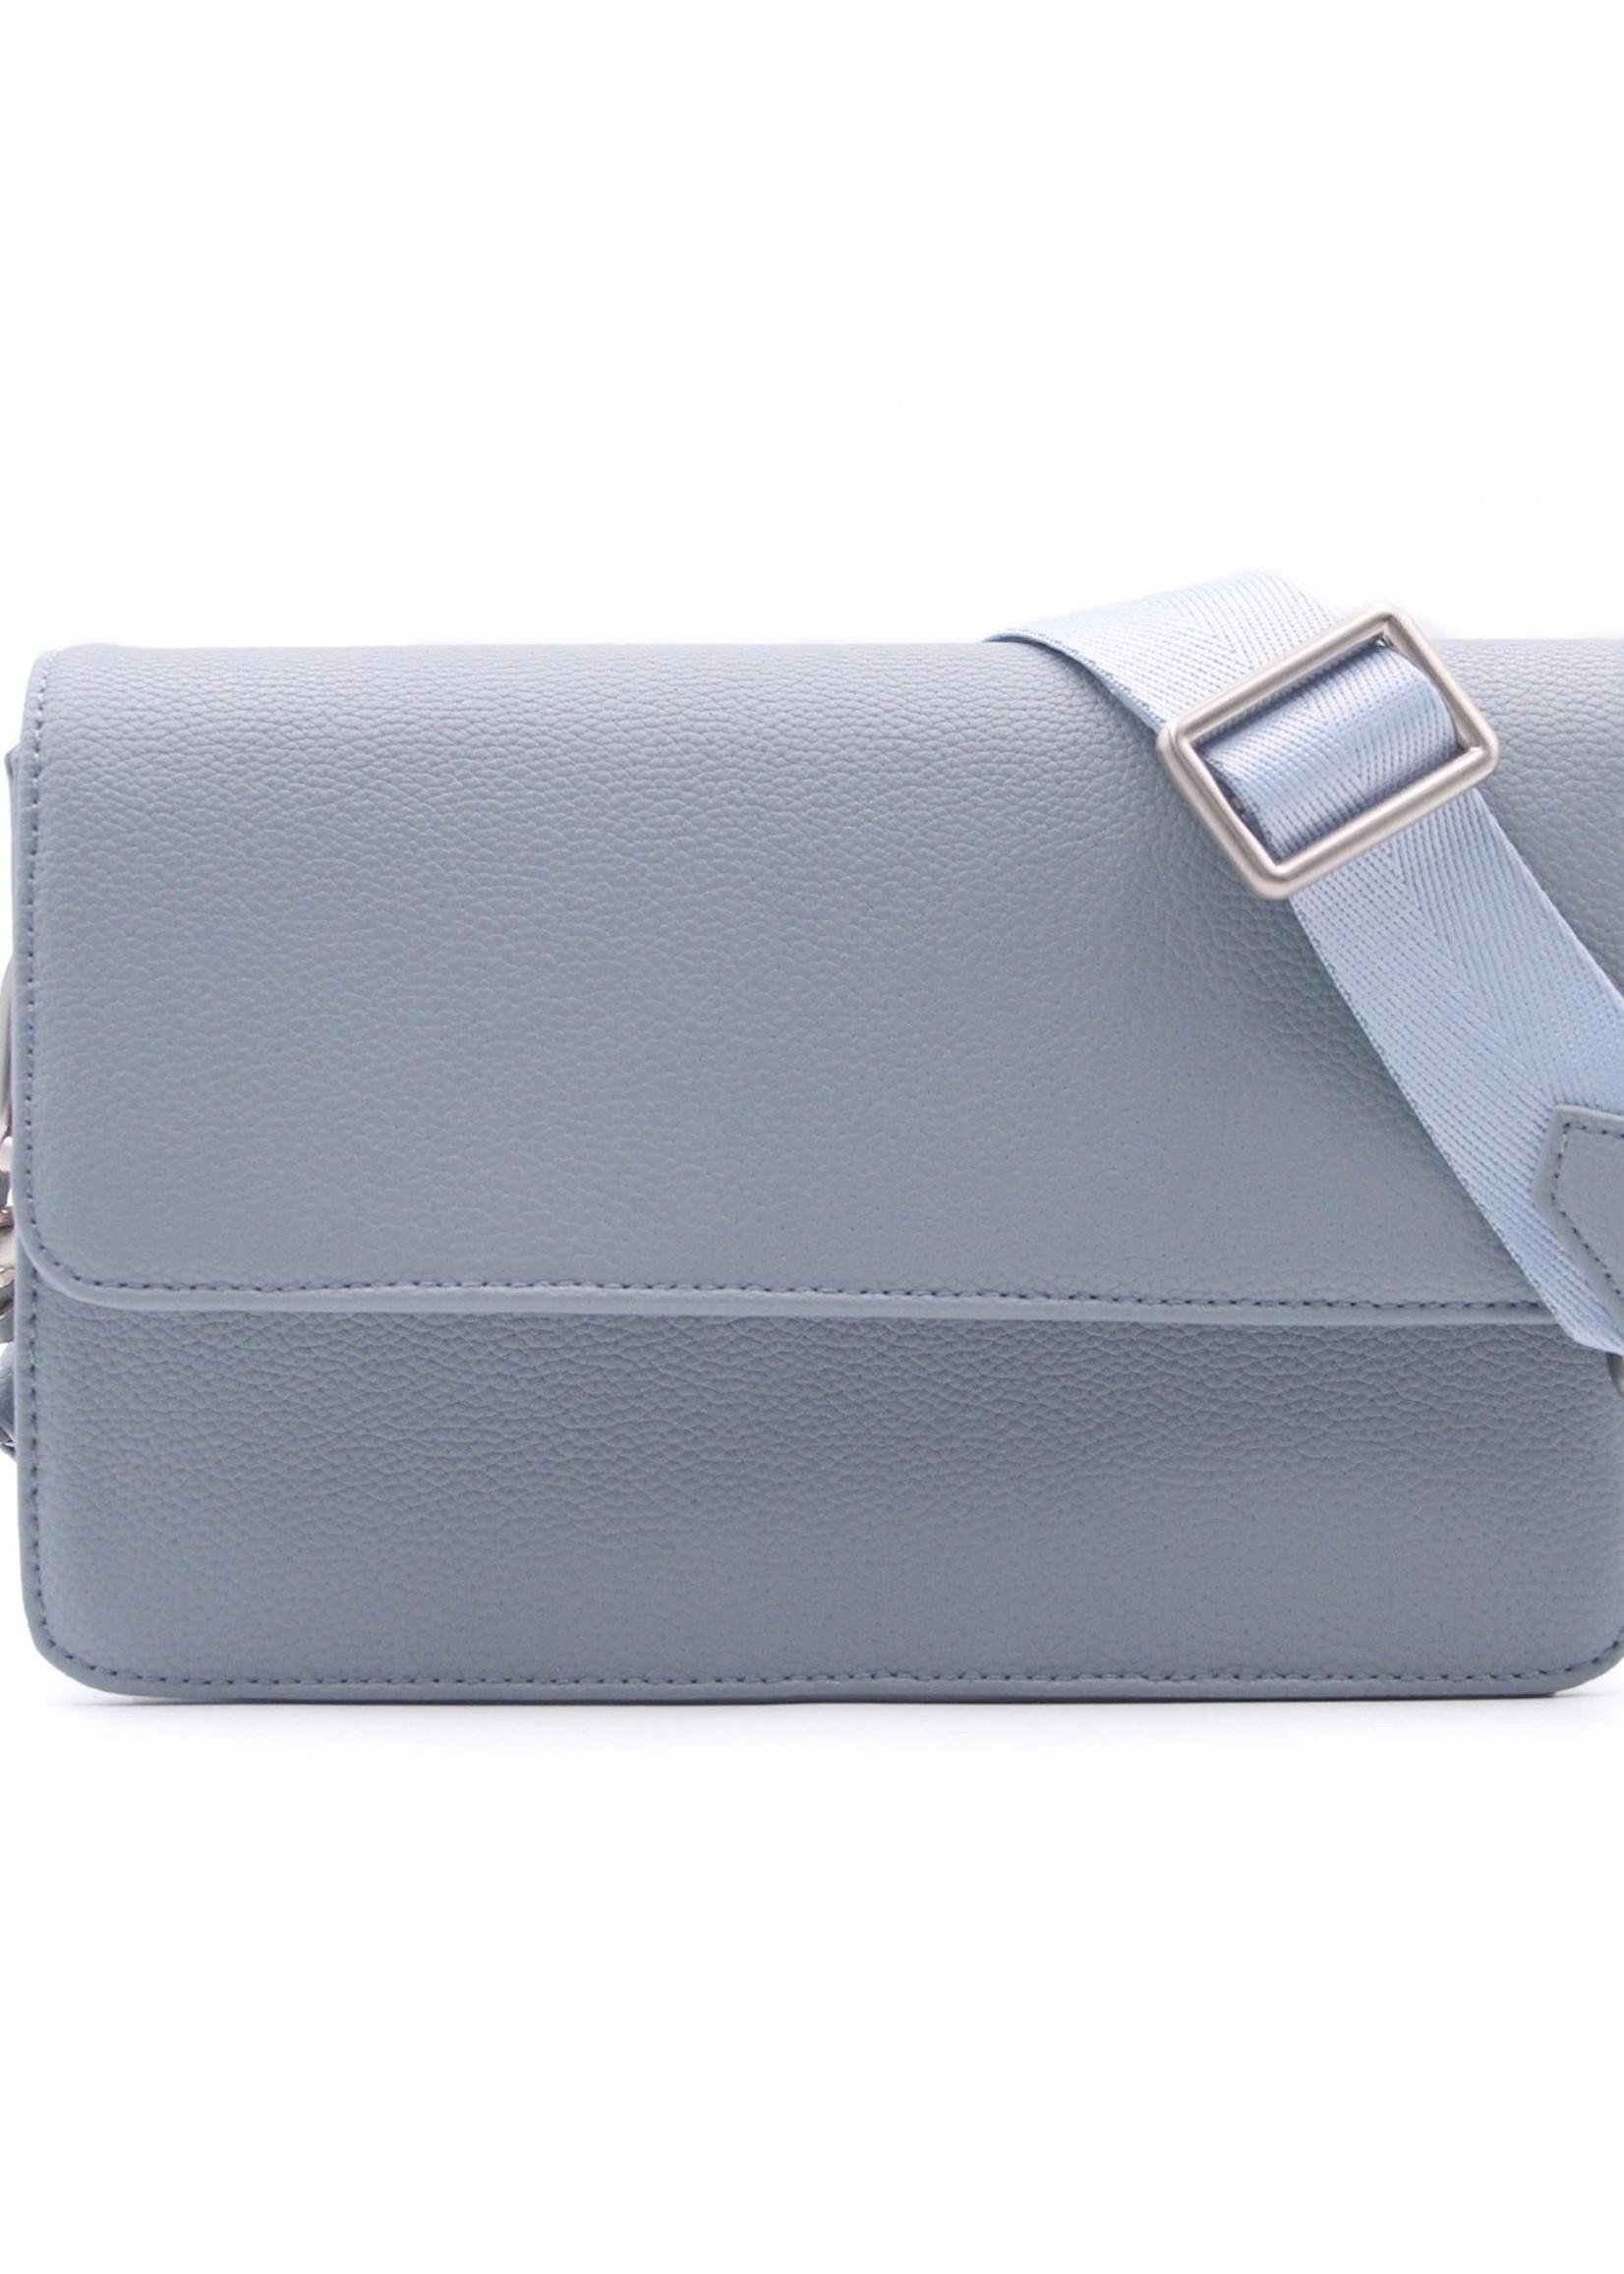 Denise Roobol Clutch Bag Milky Blue